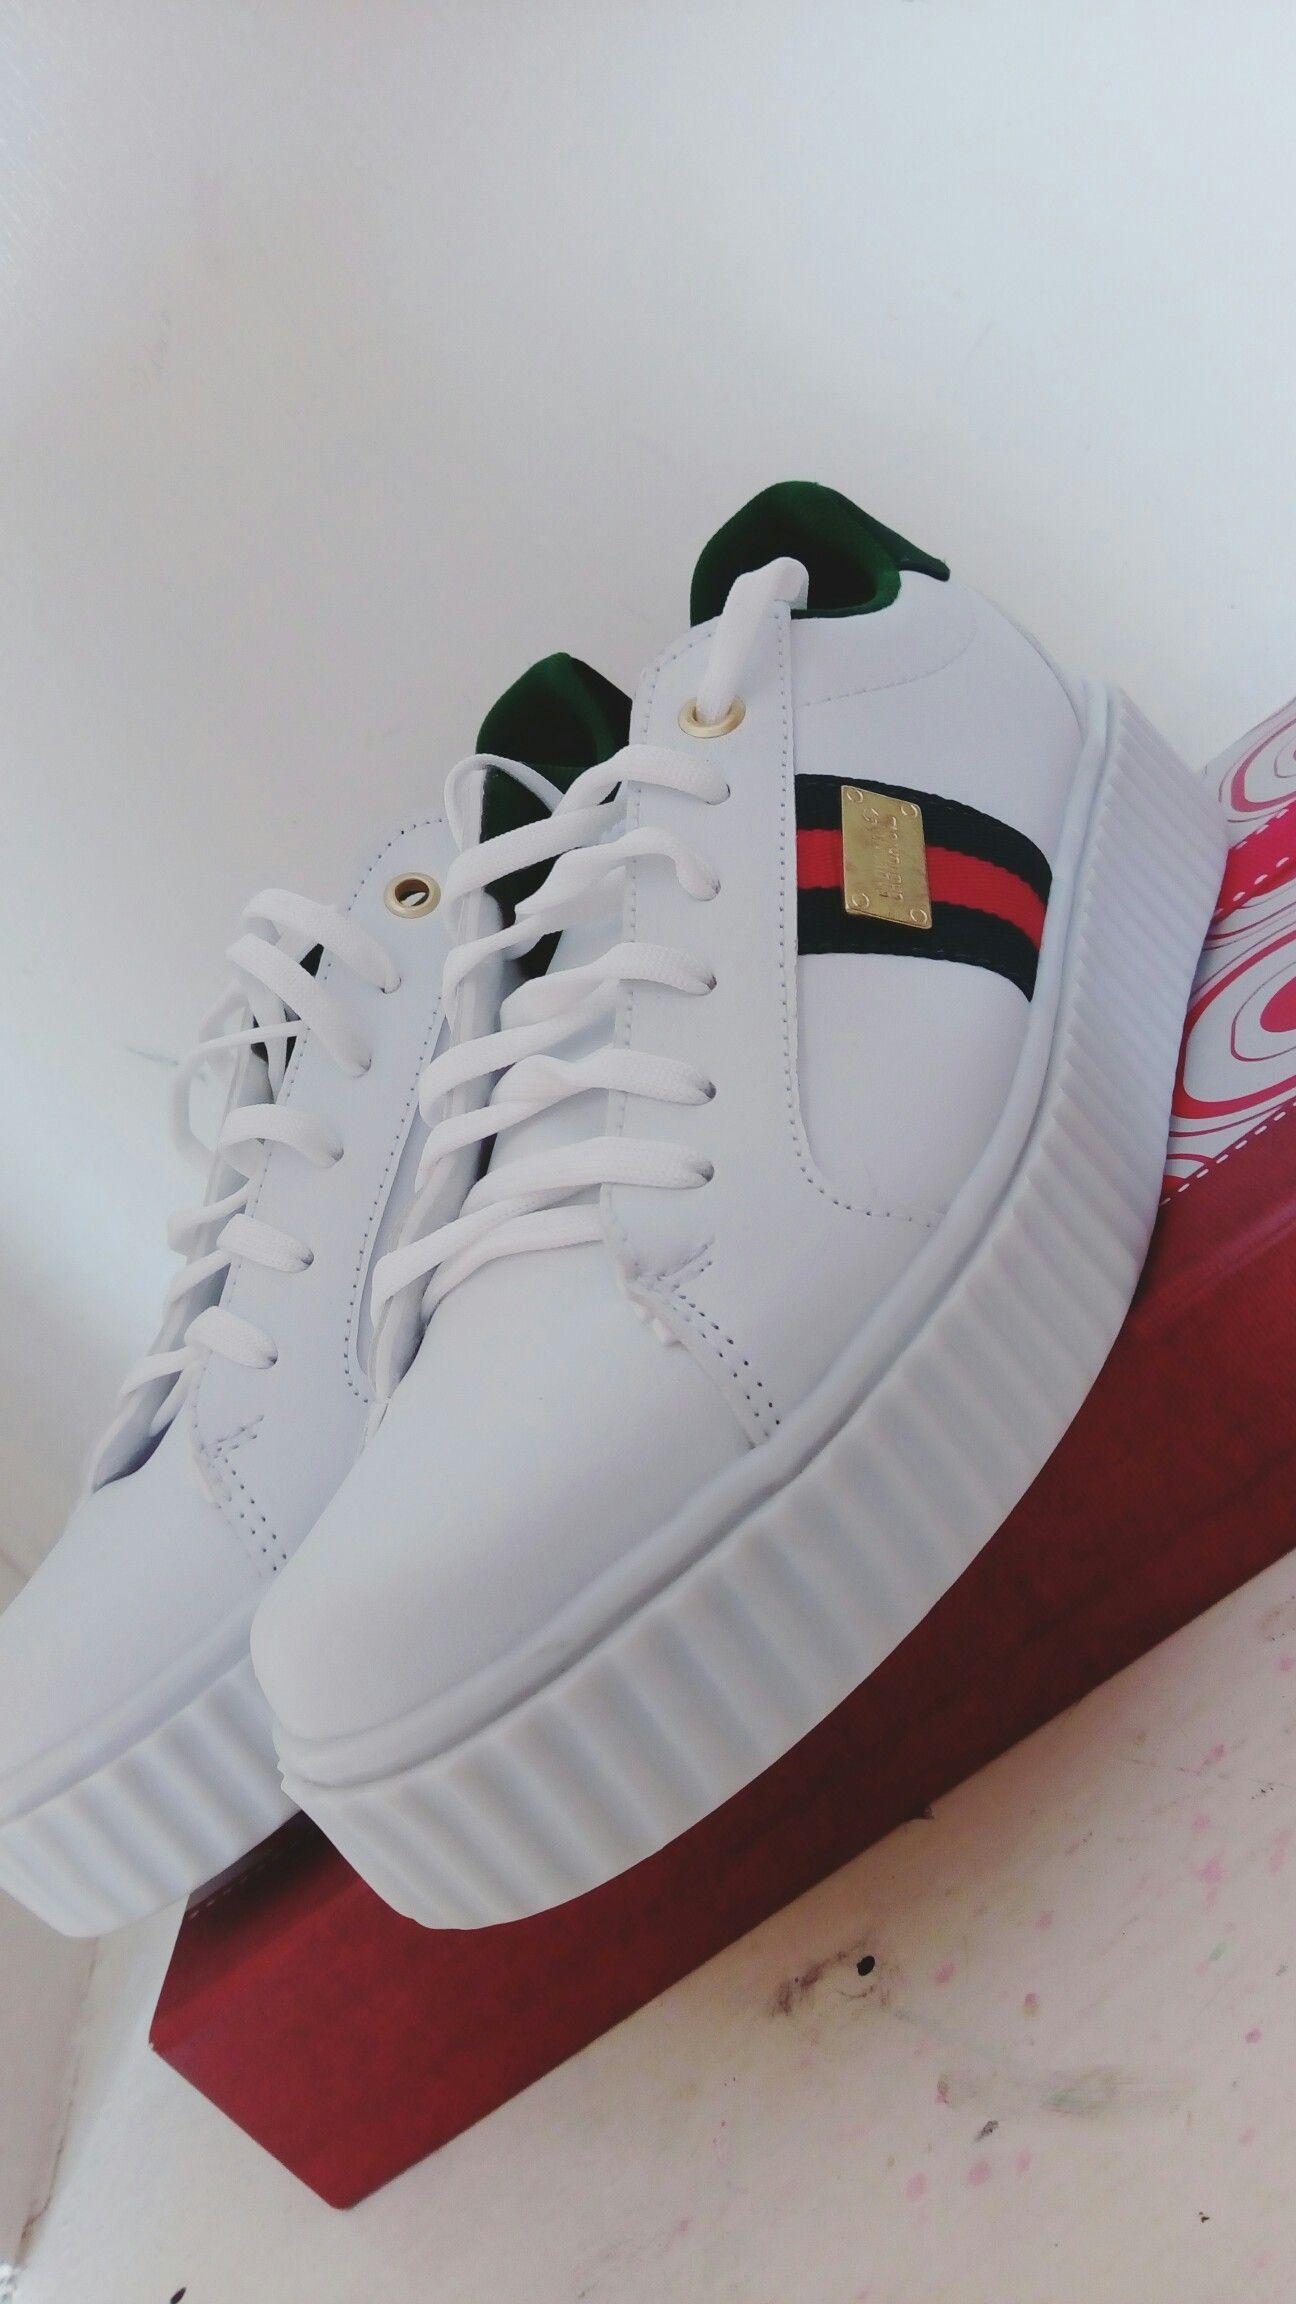 a0cb286d Pin de Friducha. en Tenis suela gruesa | Sneakers, Shoes y Fashion